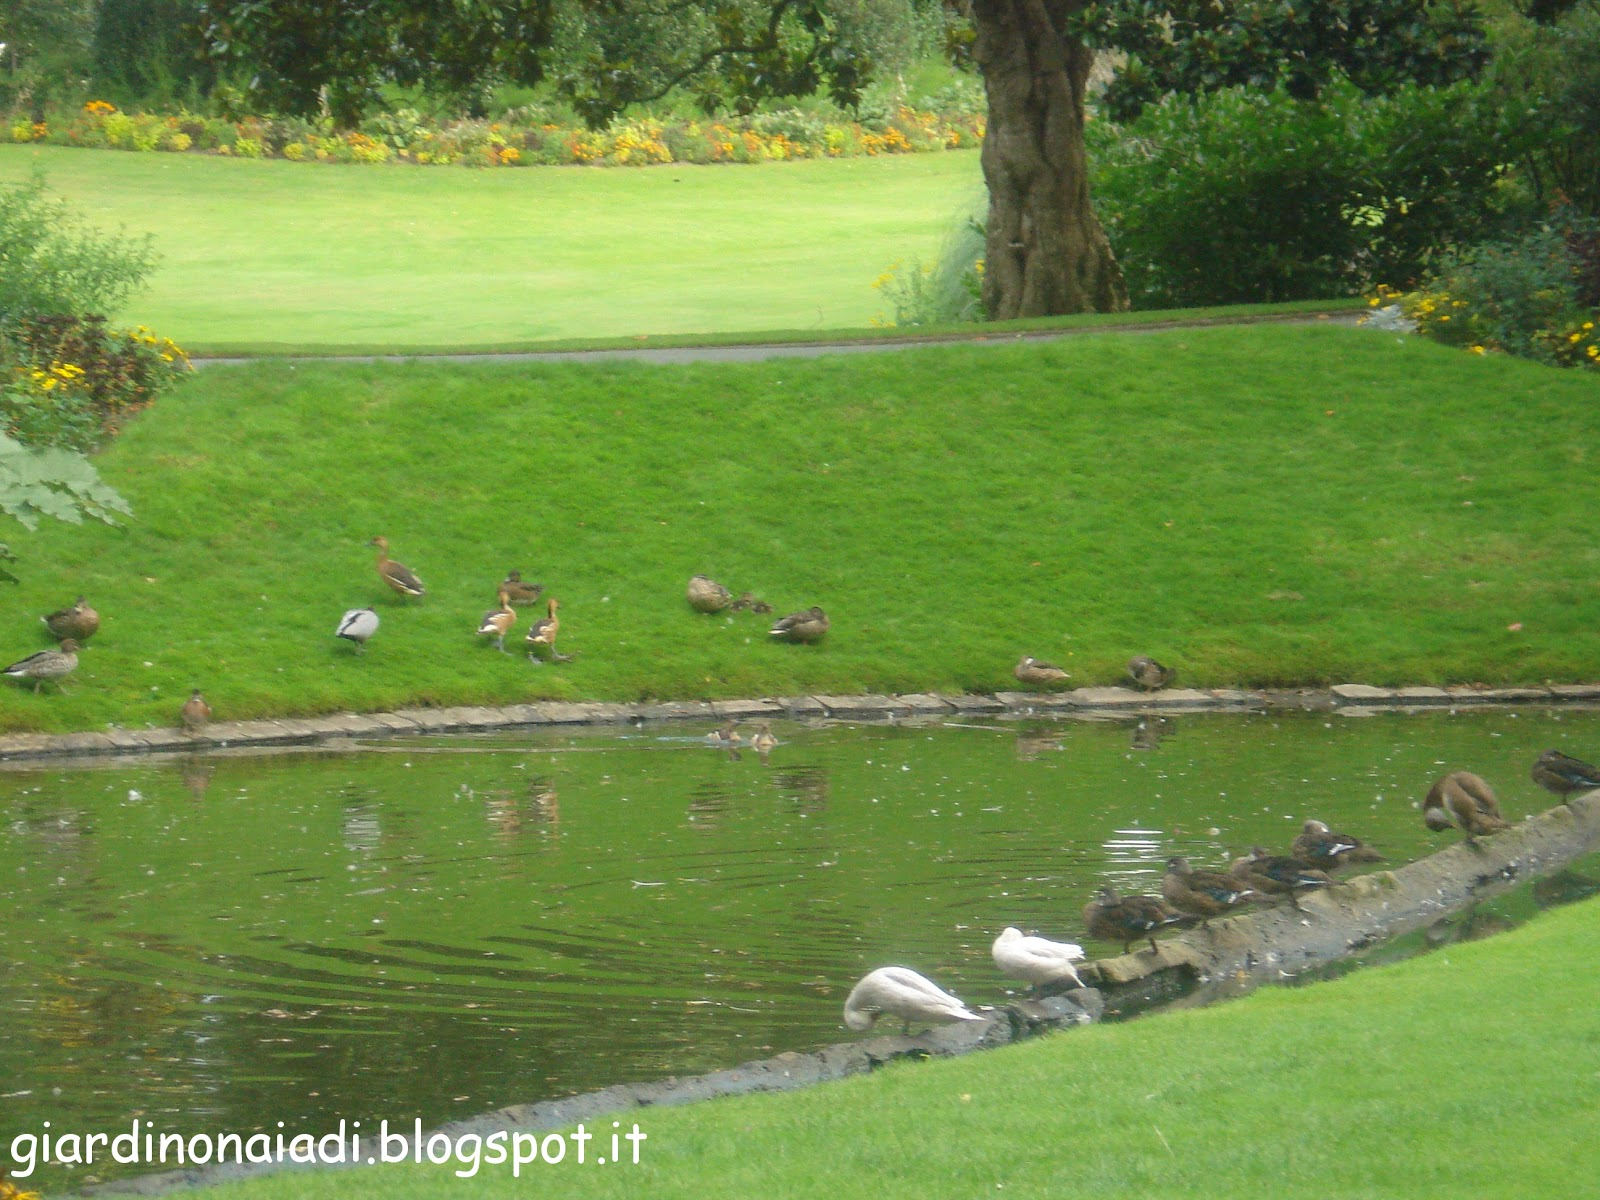 Laghetti da giardino per tartarughe stunning laguna for Laghetto tartarughe usato